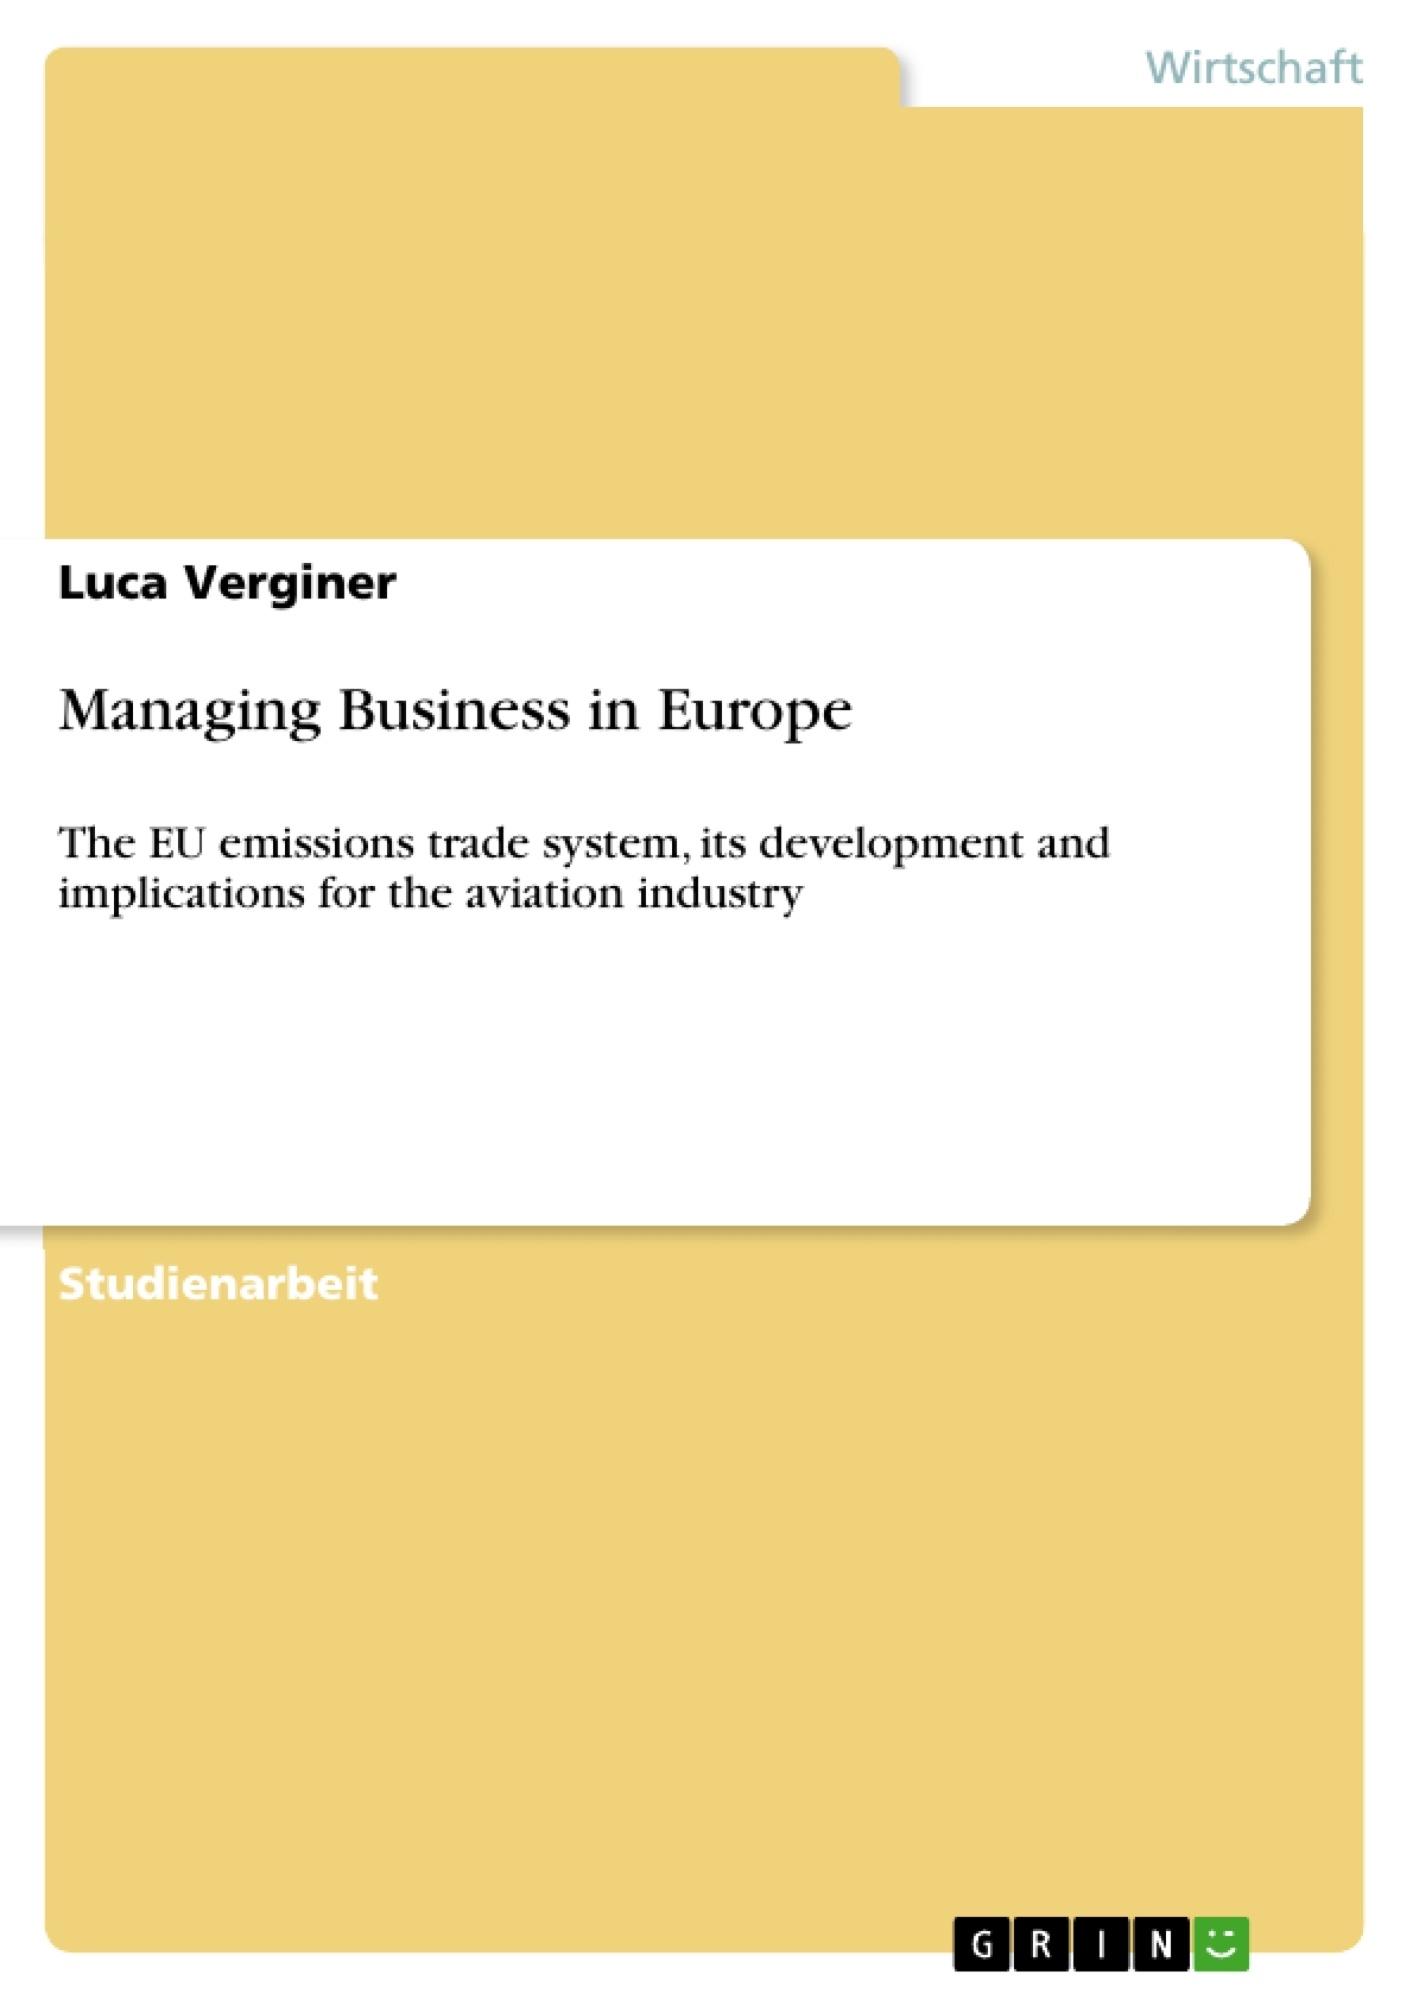 Titel: Managing Business in Europe